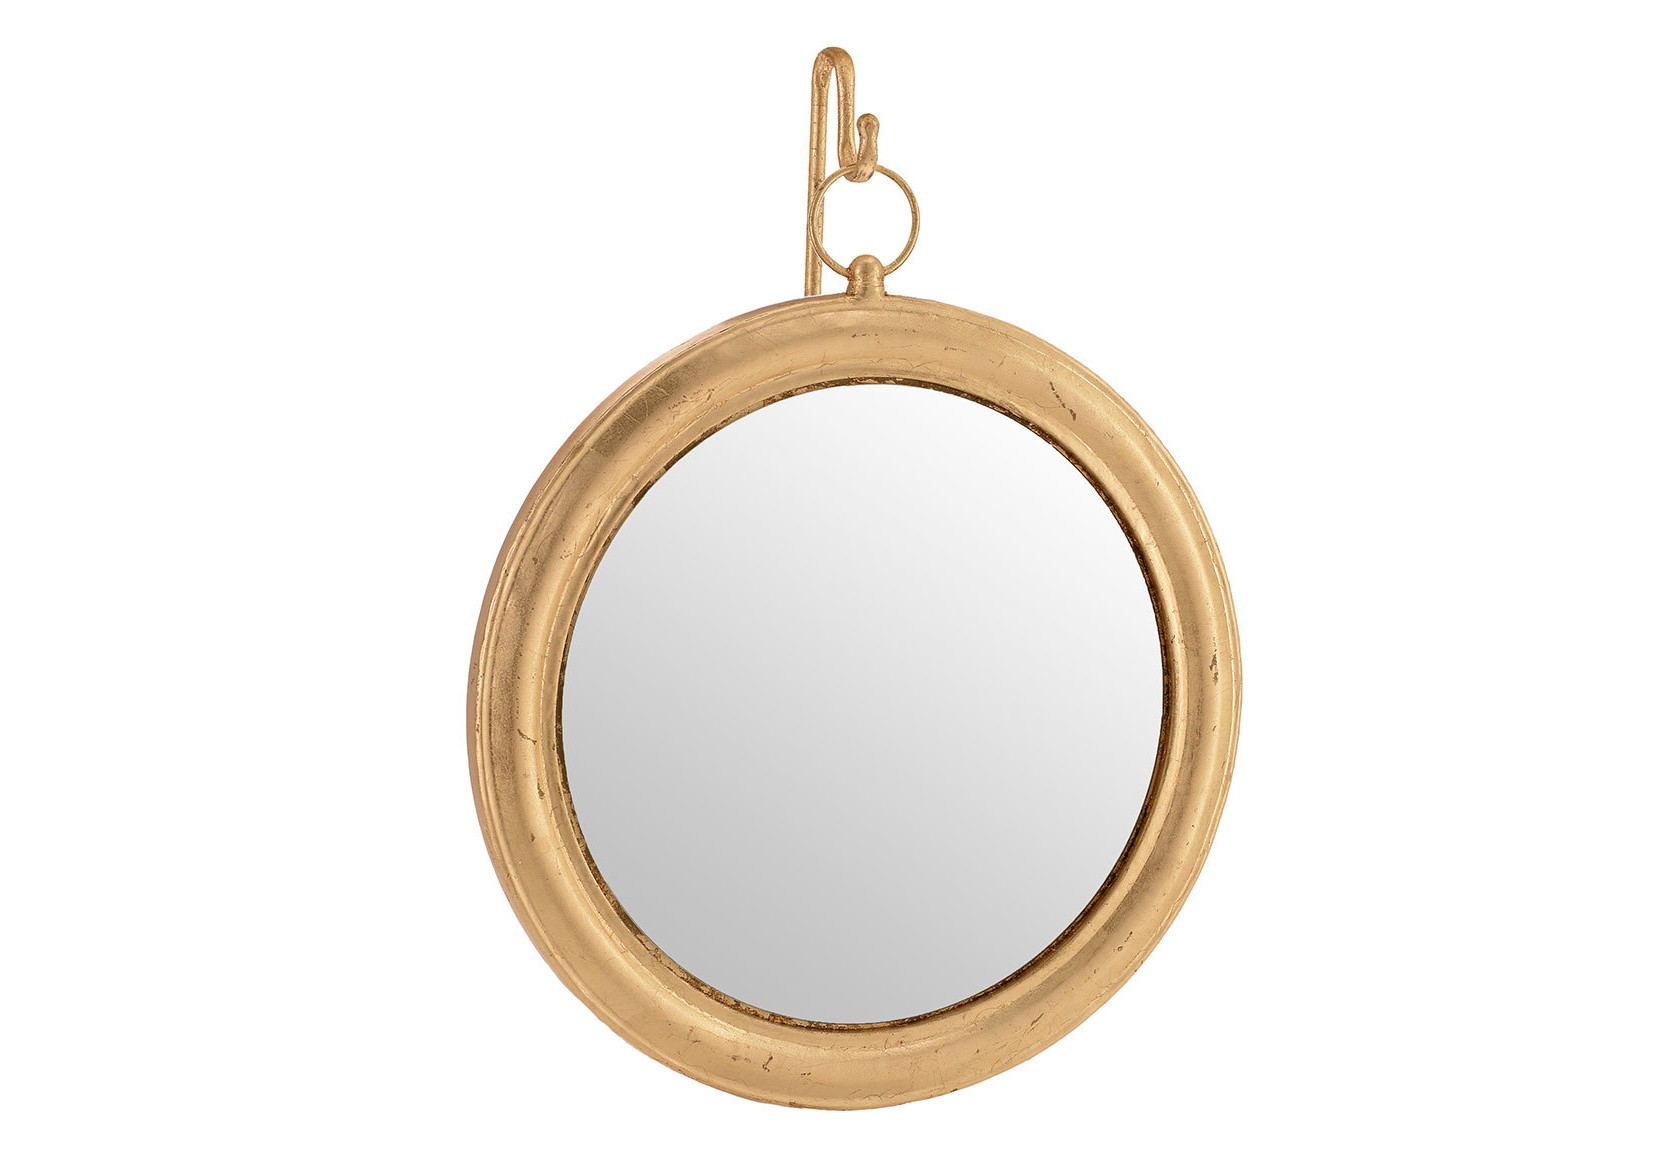 Зеркало настенное Puente del IncaНастенные зеркала<br>Зеркало настенное<br><br>Material: Металл<br>Width см: 50<br>Depth см: 3<br>Height см: 57